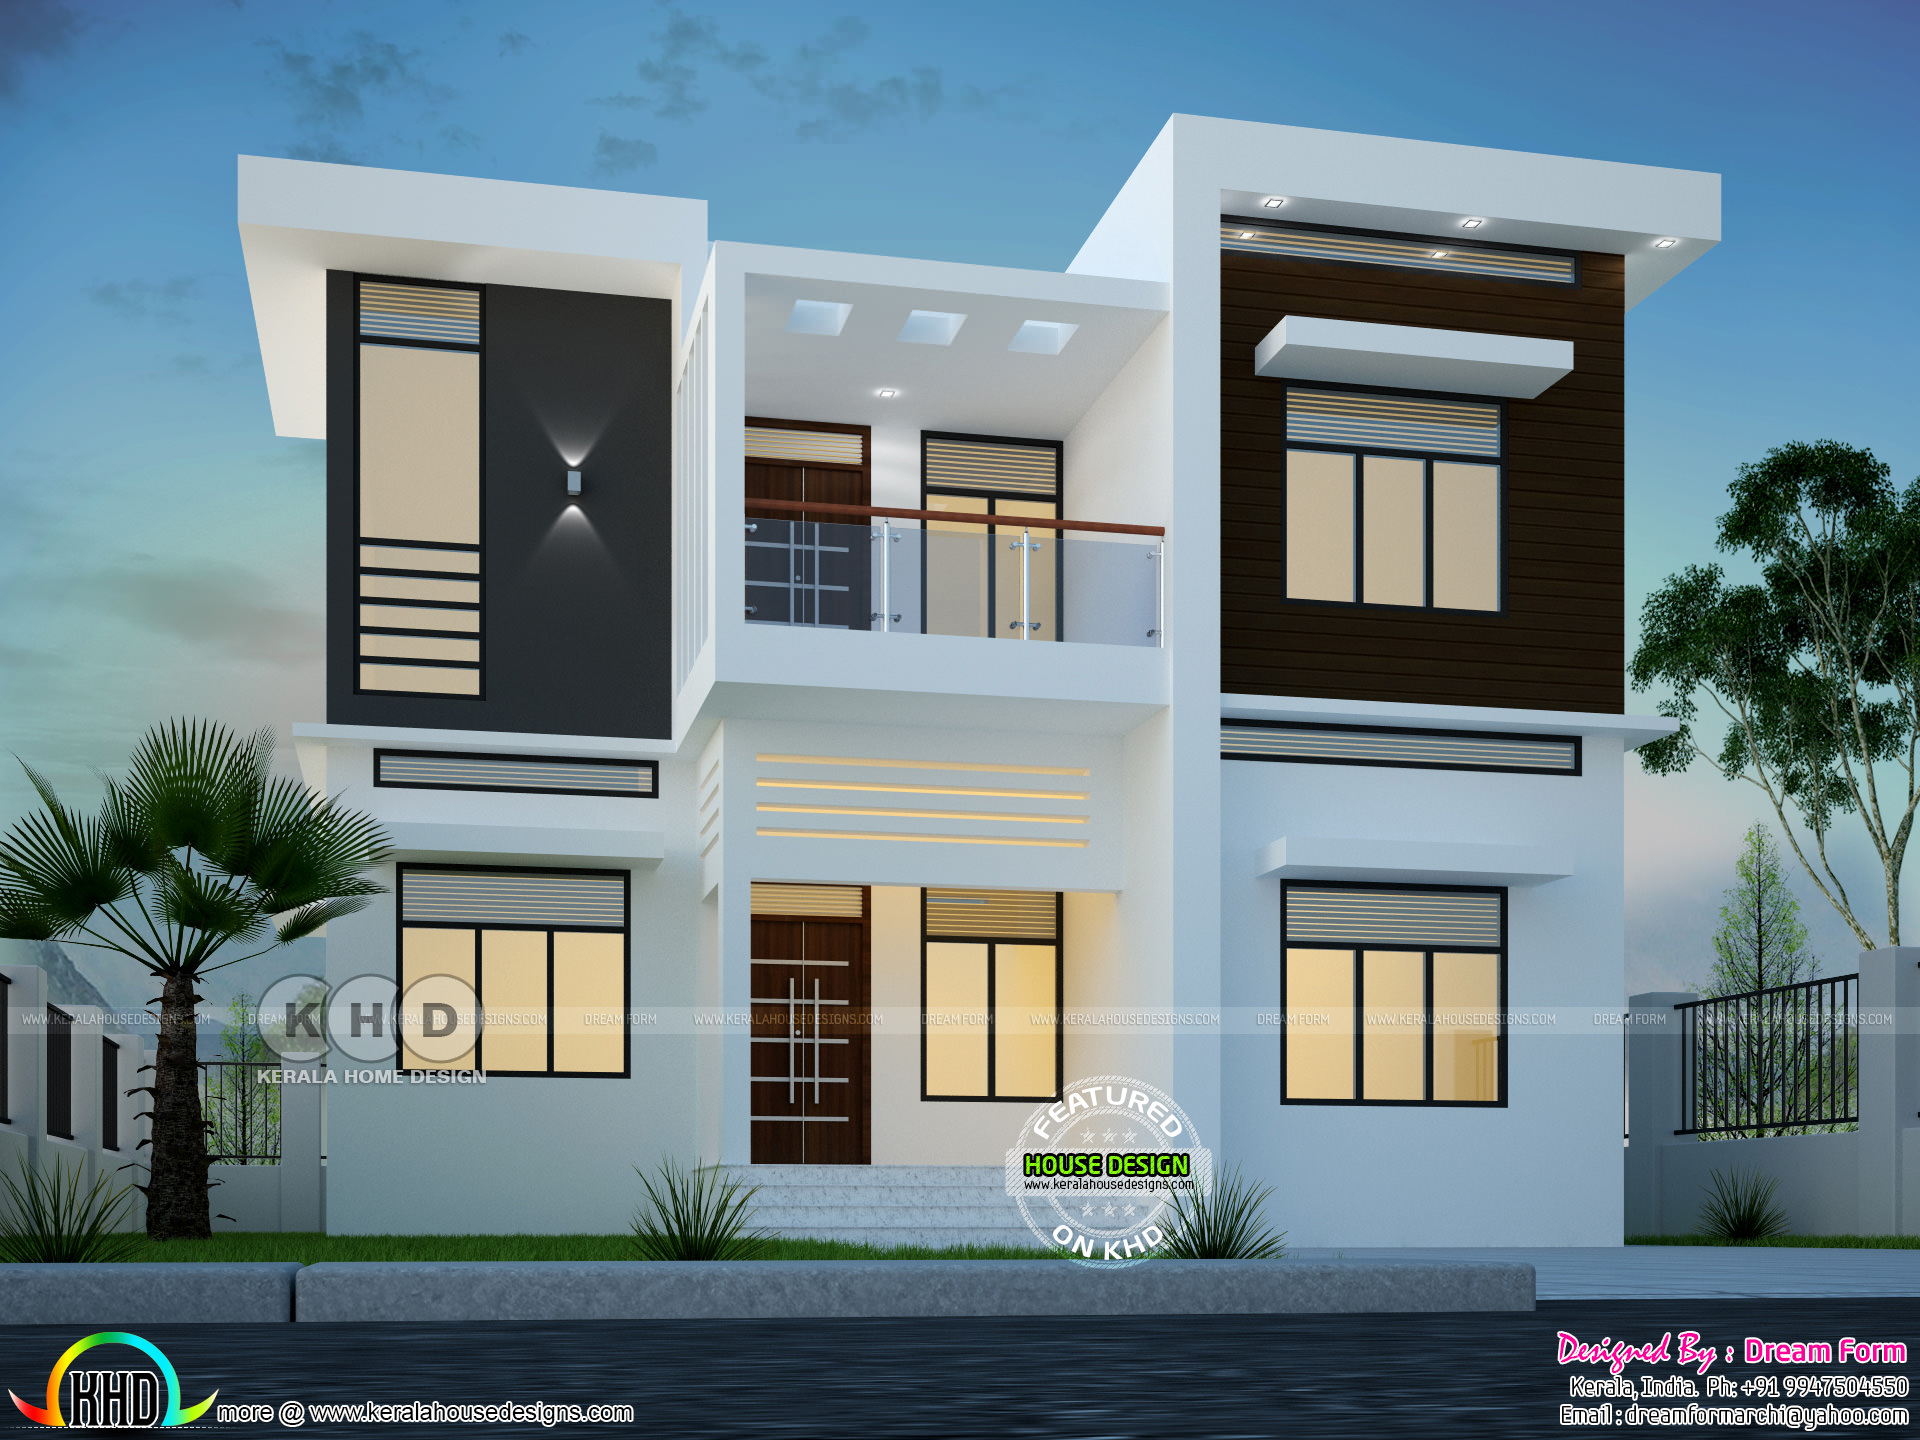 1950 square feet beautiful modern home design | Kerala home ... on 1250 sq ft home, 900 sf home, 3800 sq ft home, 2200 sq ft home, 650 sq ft home, 700 sq ft home, 720 sq ft home, 2800 sq ft home, 3100 sq ft home, 560 sq ft home, 625 sq ft home, 1700 sq ft home, 1000 sq ft home, 450 sq ft home, 2100 sq ft home, 600 sq ft home, 350 sq ft home, 950 sq ft home, 1152 sq ft home, 850 sq ft home,